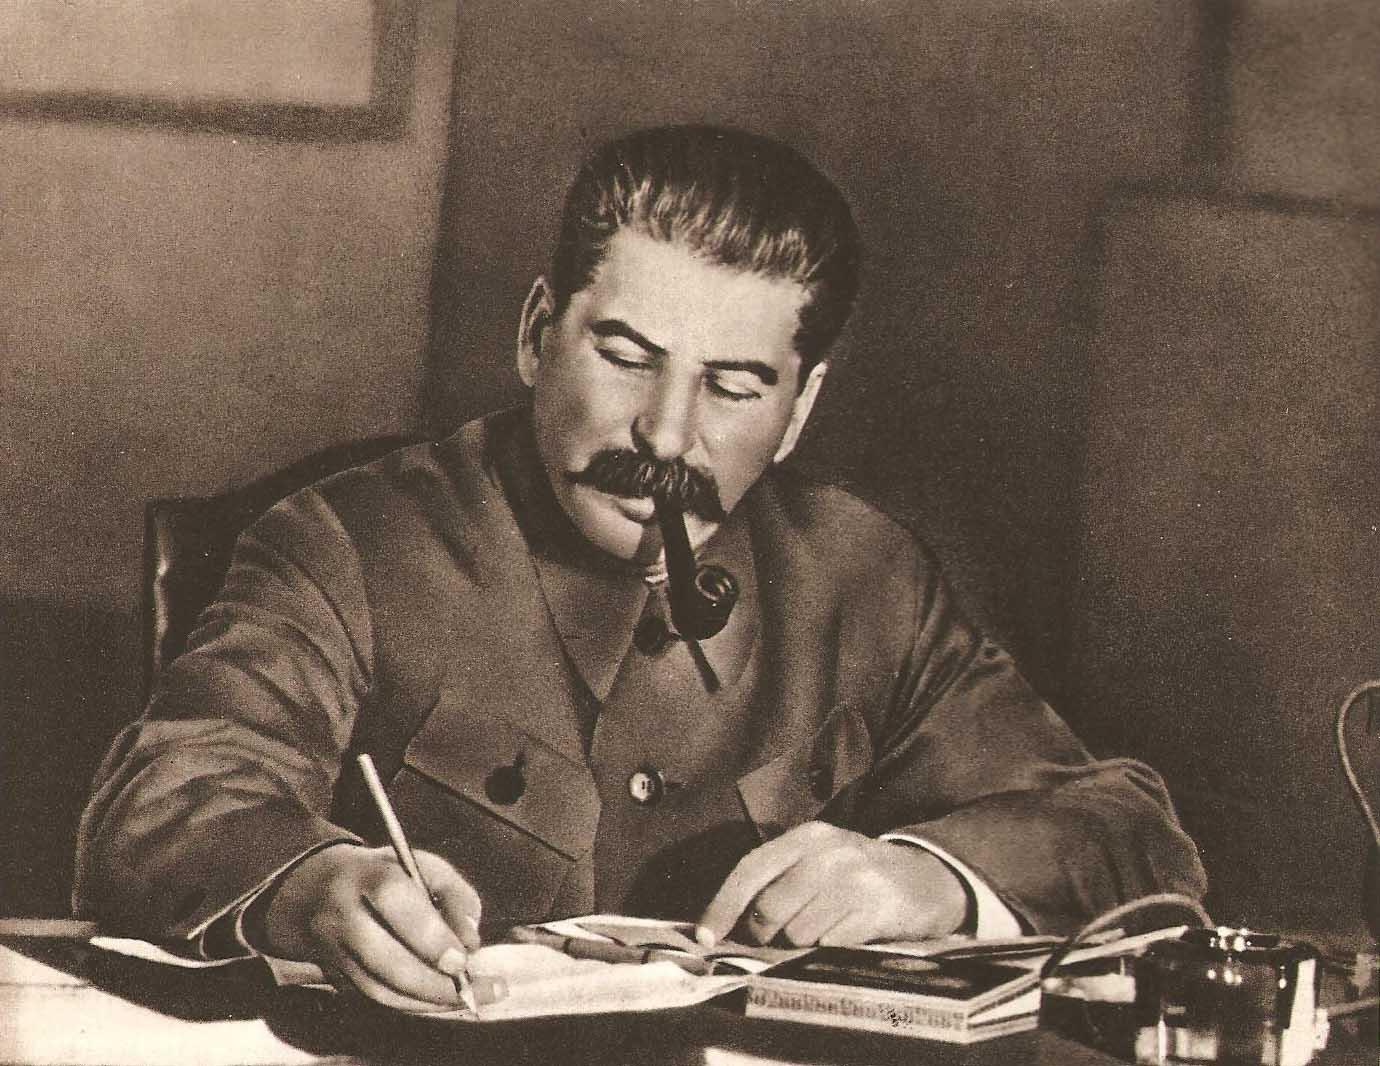 Joseph+Stalin%252C+1949.jpg